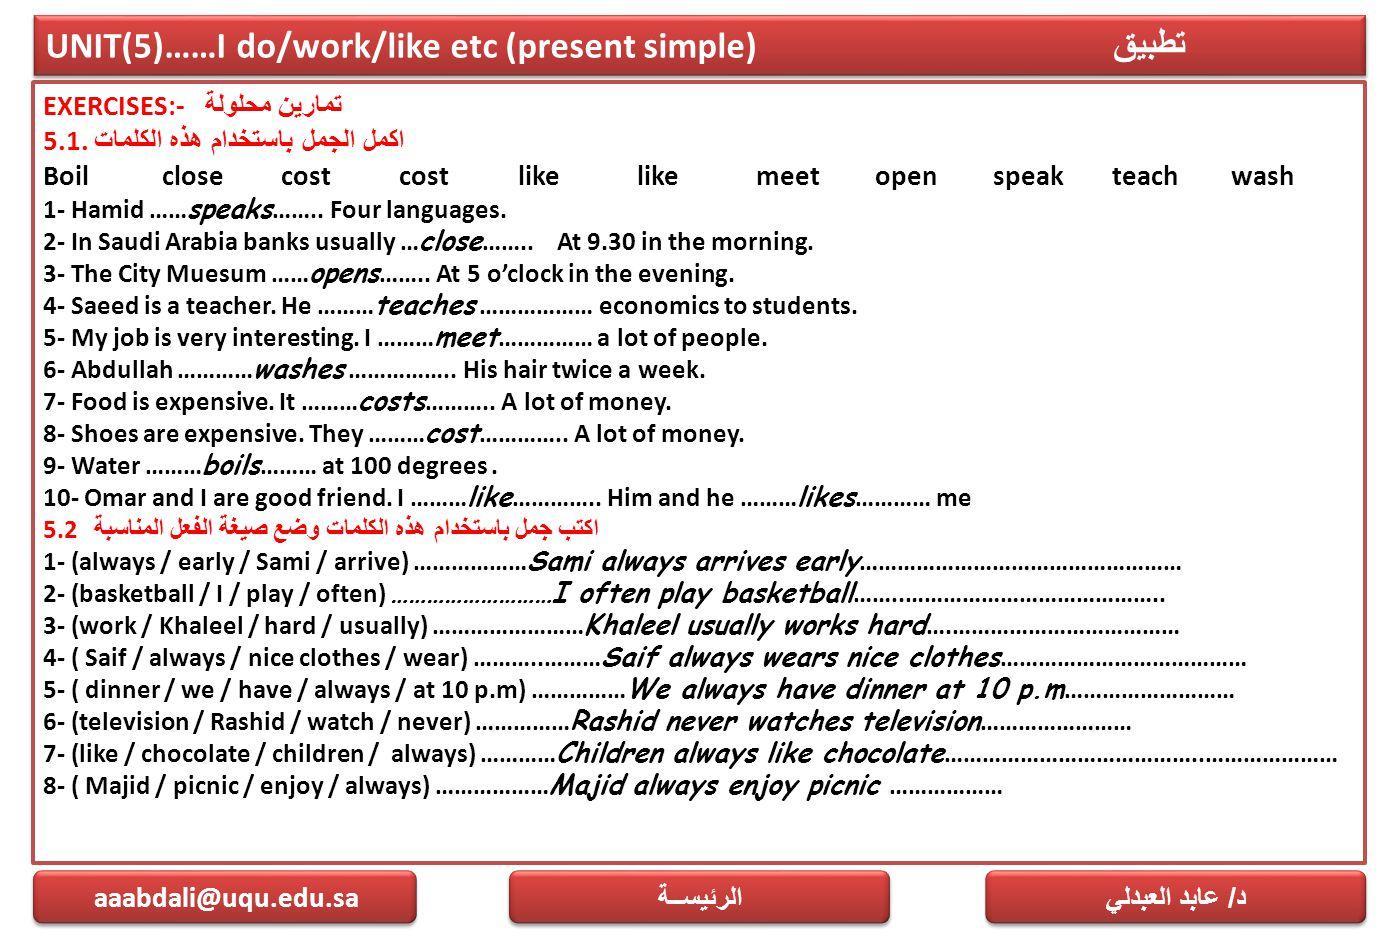 UNIT(5)……I do/work/like etc (present simple) تطبيق EXERCISES:- تمارين محلولة 5.1. اكمل الجمل باستخدام هذه الكلمات Boilclosecostcostlikelikemeetopenspe